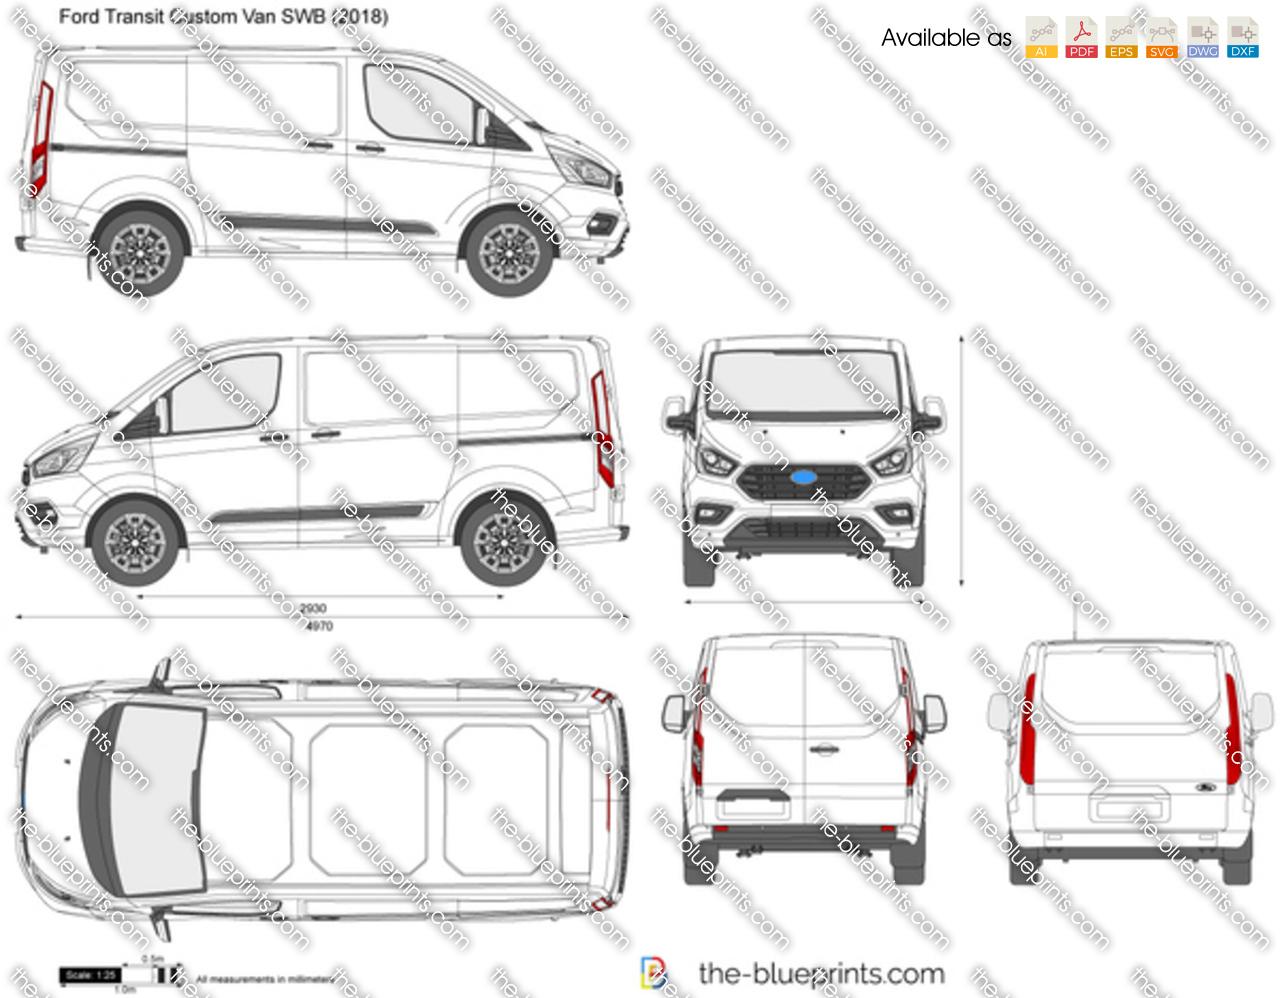 Ford Transit Custom Van SWB